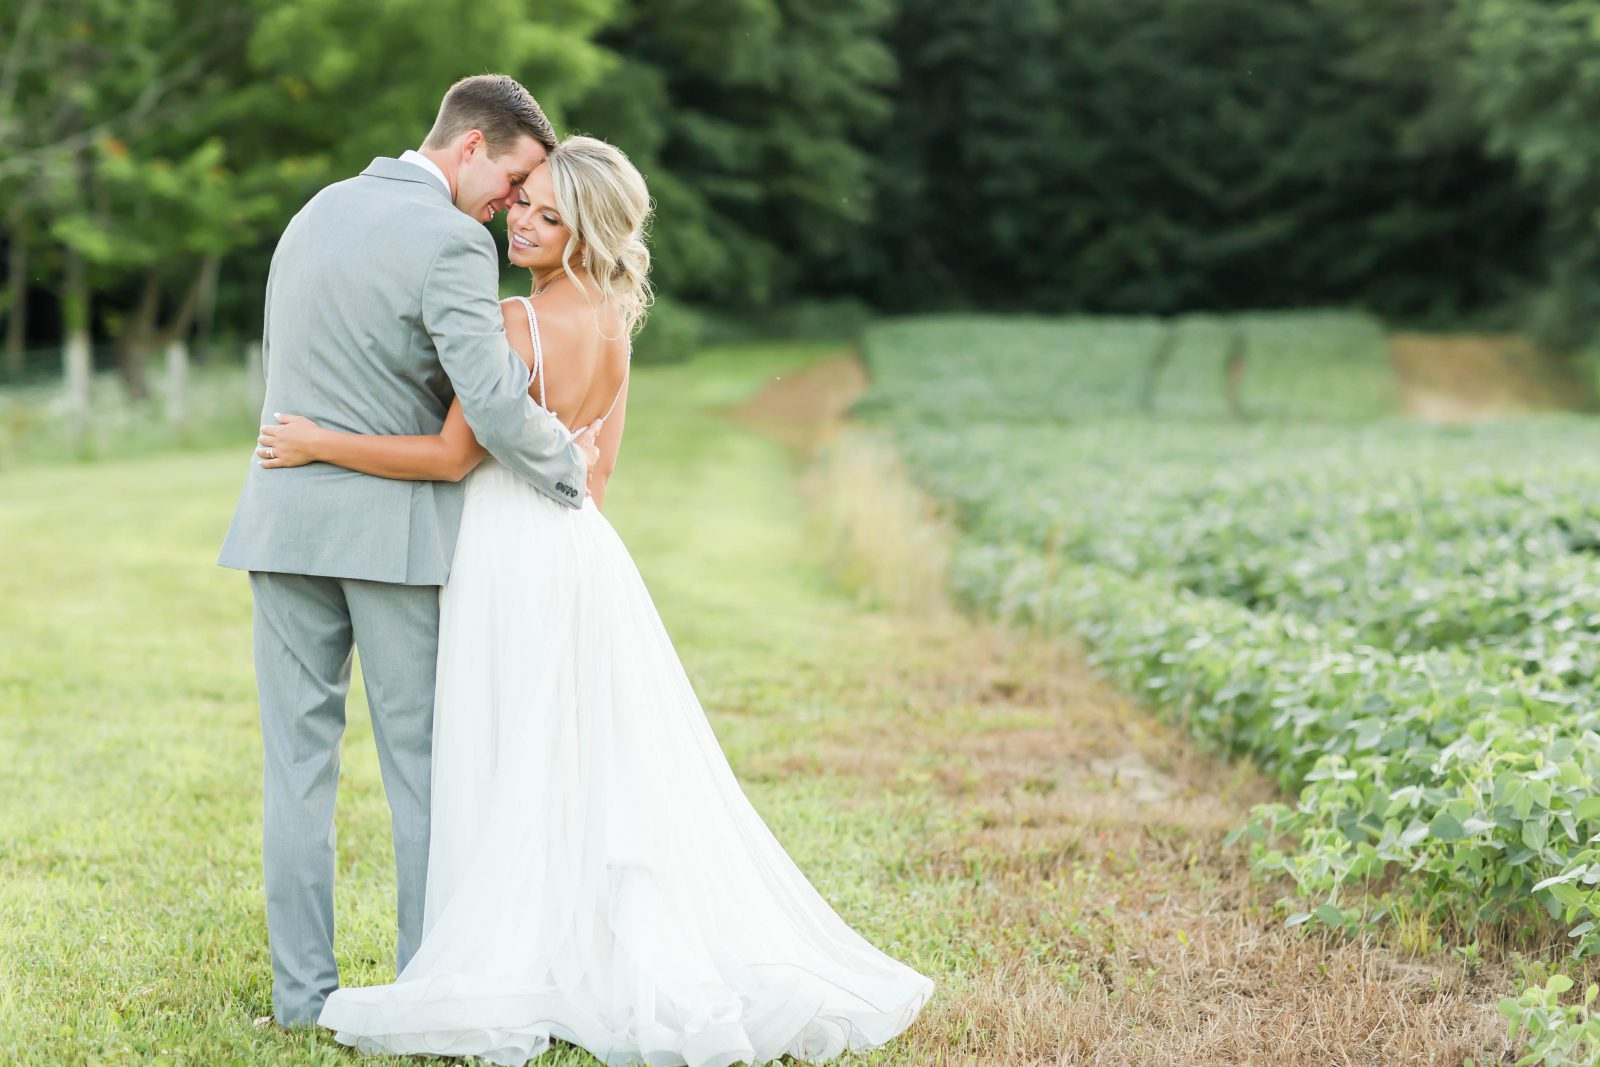 peacock-ridge-summer-wedding-photographer-akron-ohio-loren-jackson-photography-125